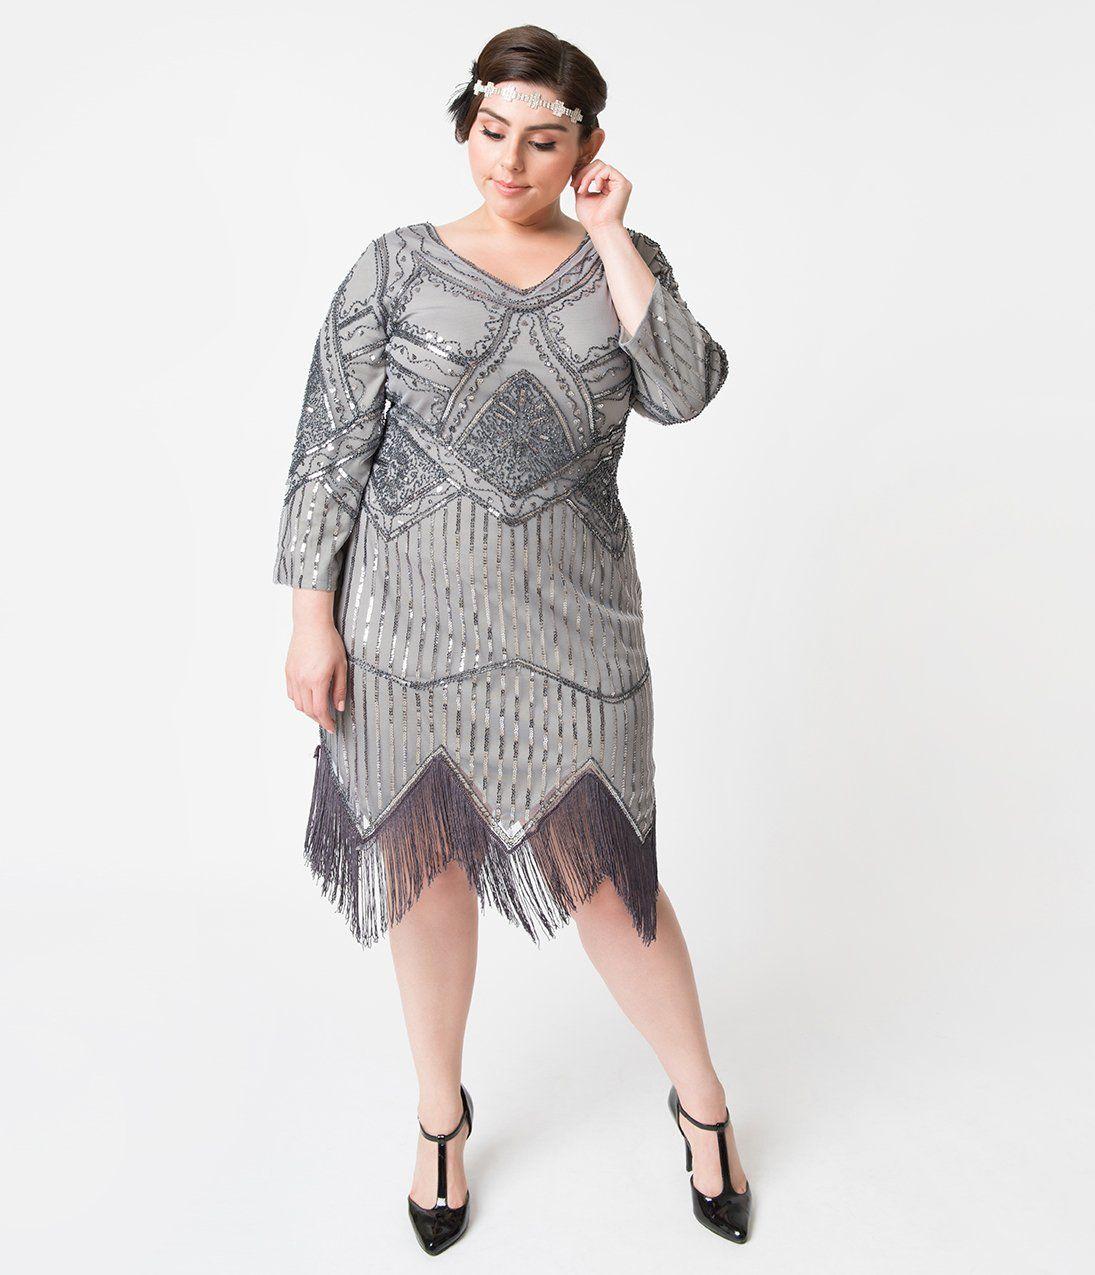 1920s Plus Size Flapper Dresses Gatsby Dresses Flapper Costumes Unique Vintage Plus Size 192 Plus Size Flapper Dress Plus Size Flapper Costume Unique Dresses [ 1275 x 1095 Pixel ]